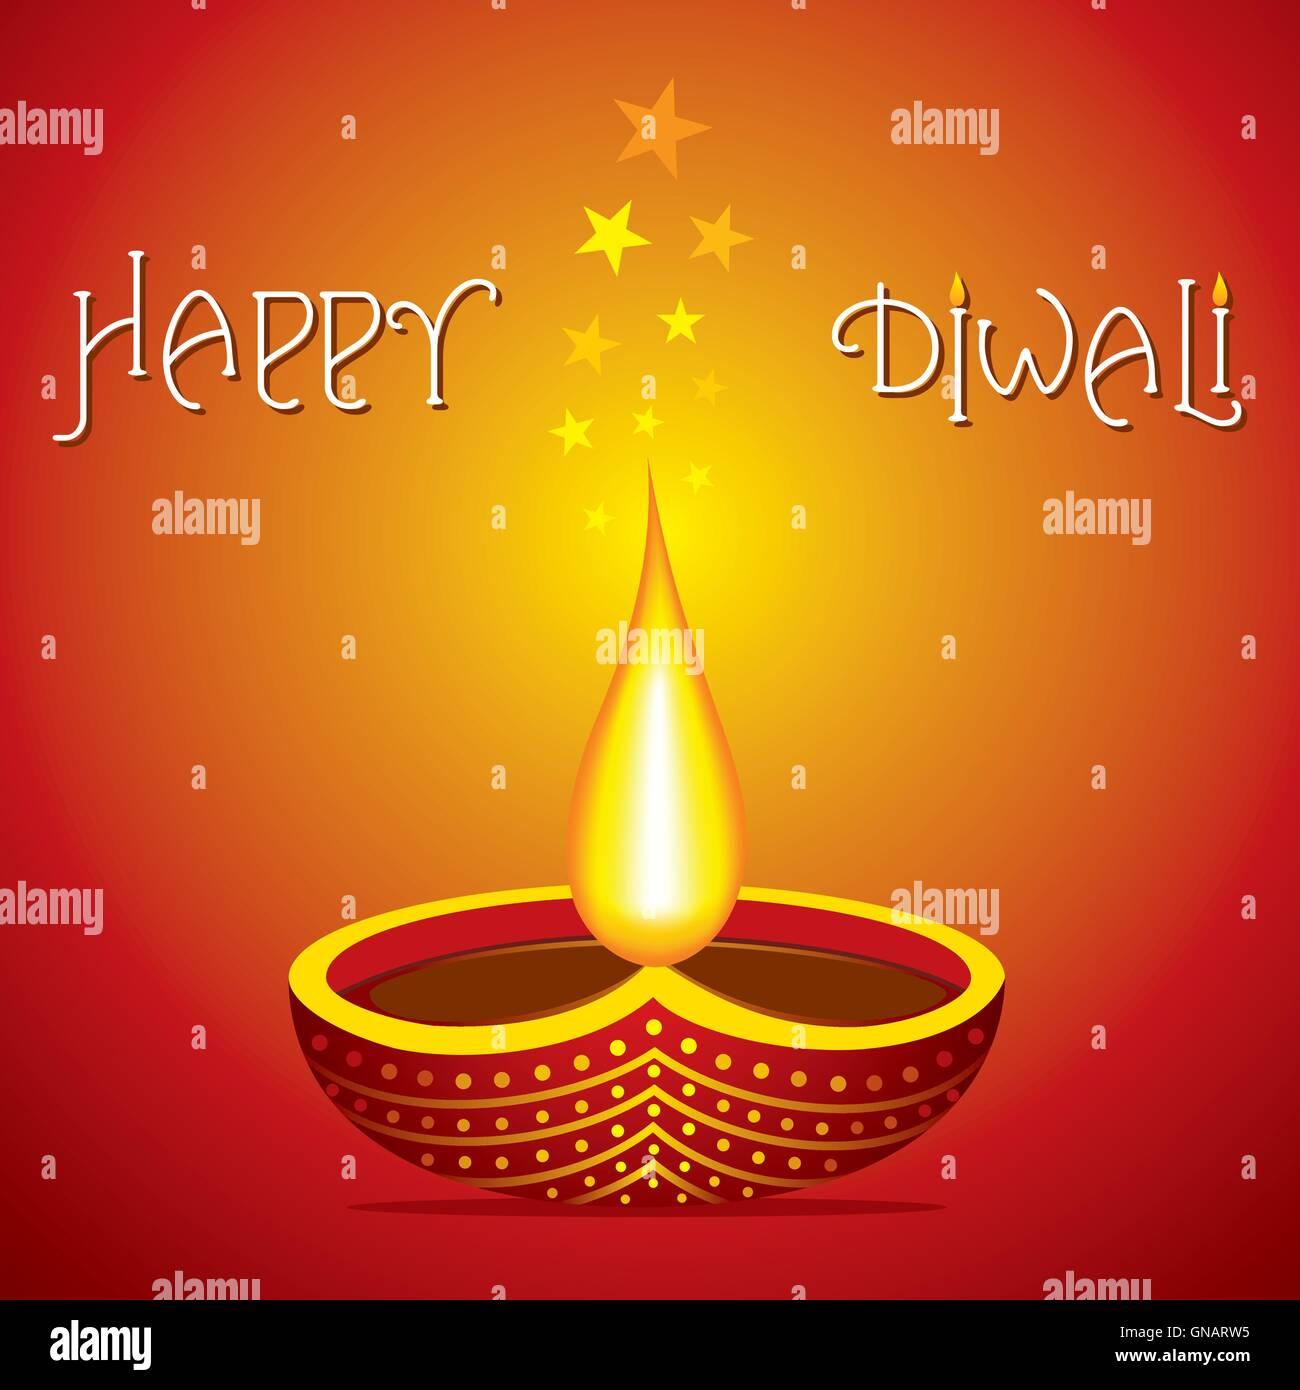 Happy diwali greeting card with girl birthday invitations free happy diwali greeting card design stock vector art illustration happy diwali greeting card design gnarw5 stock kristyandbryce Choice Image